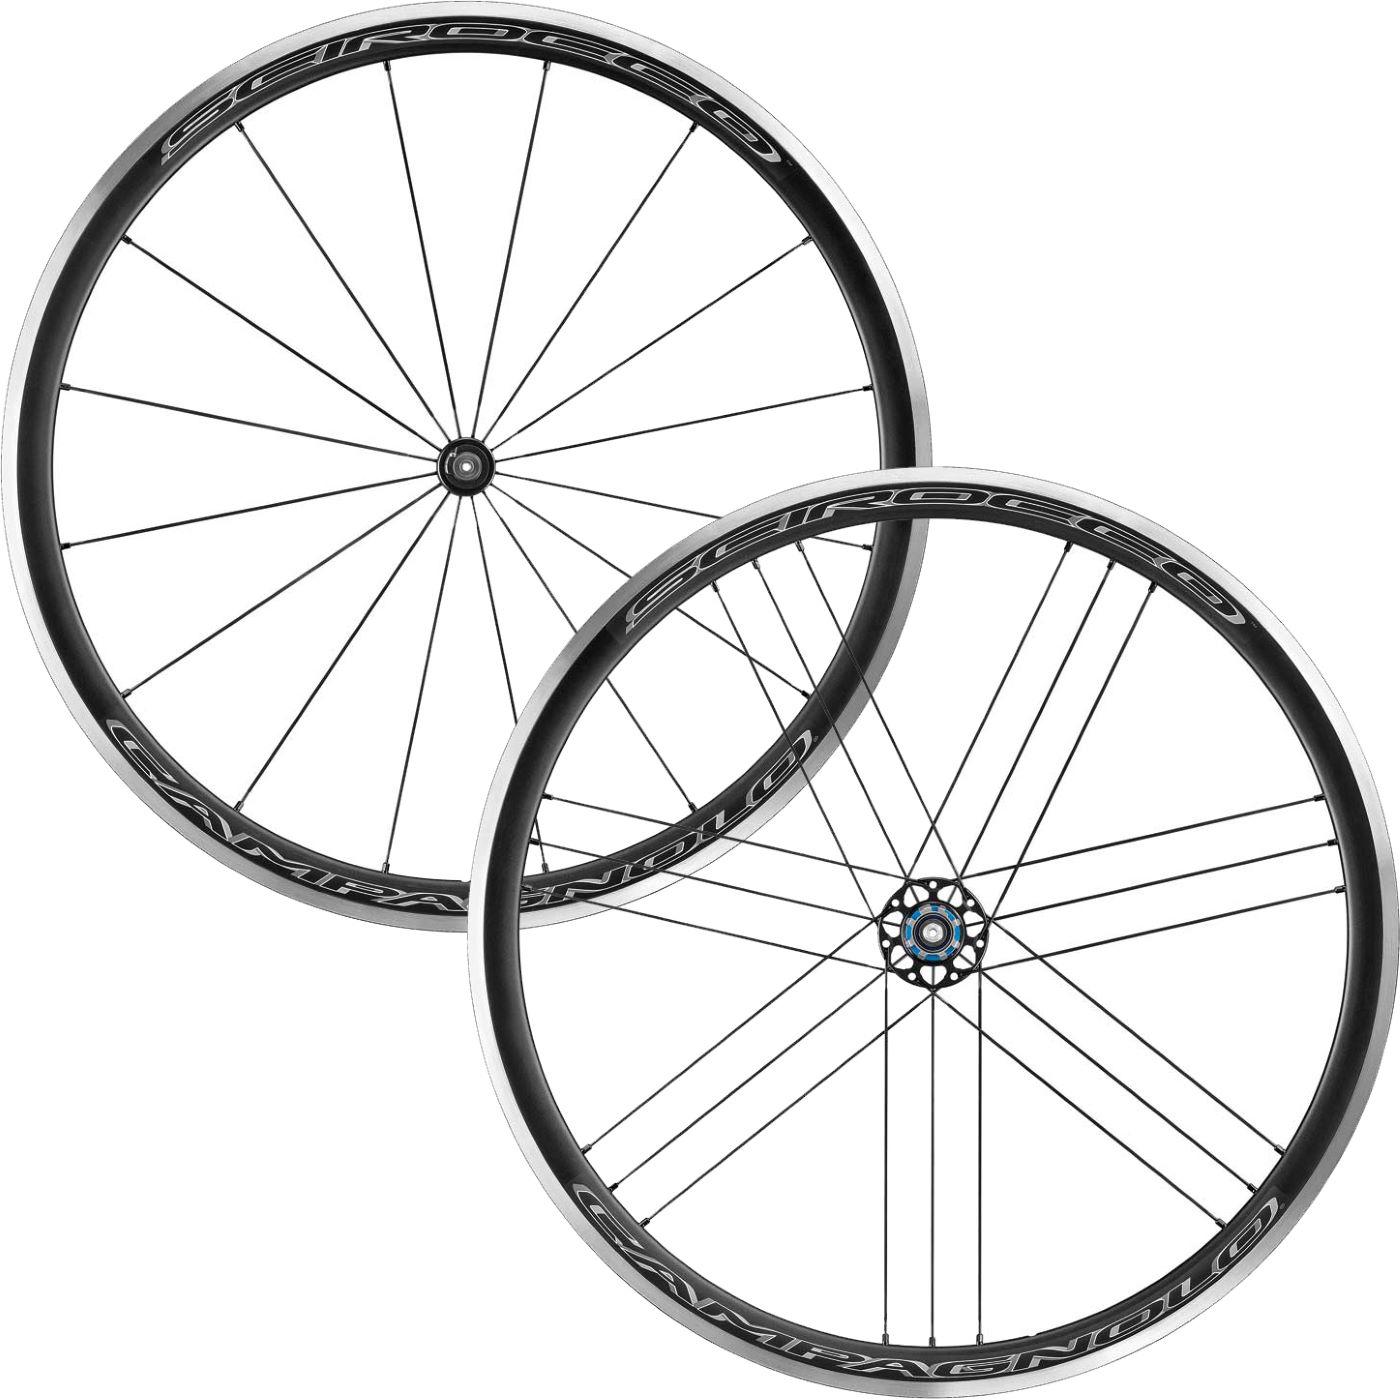 Campagnolo Scirocco C17 Clincher Road Wheelset